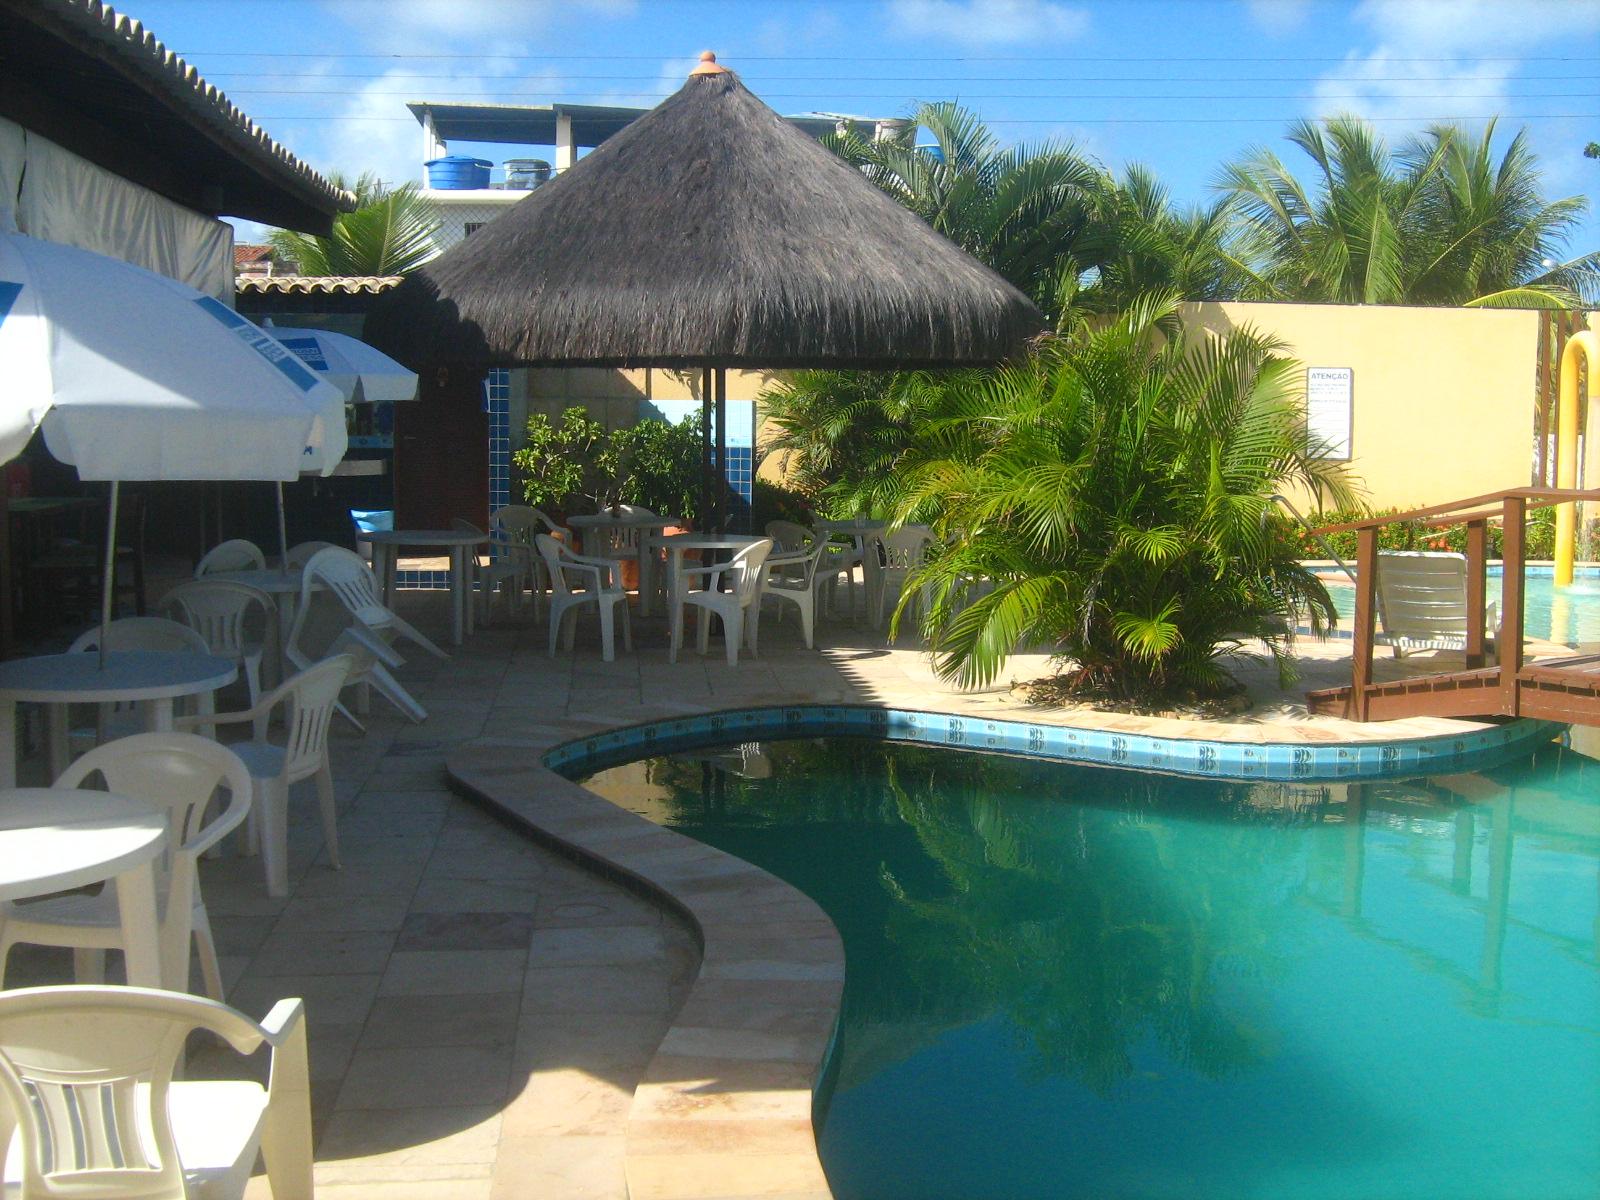 VIAJANTE ESPECIAL: Hotel Enseada dos Corais Cabo de Sto.Agostinho  #0F72BC 1600x1200 Banheiro Adaptado Deficiente Fisico